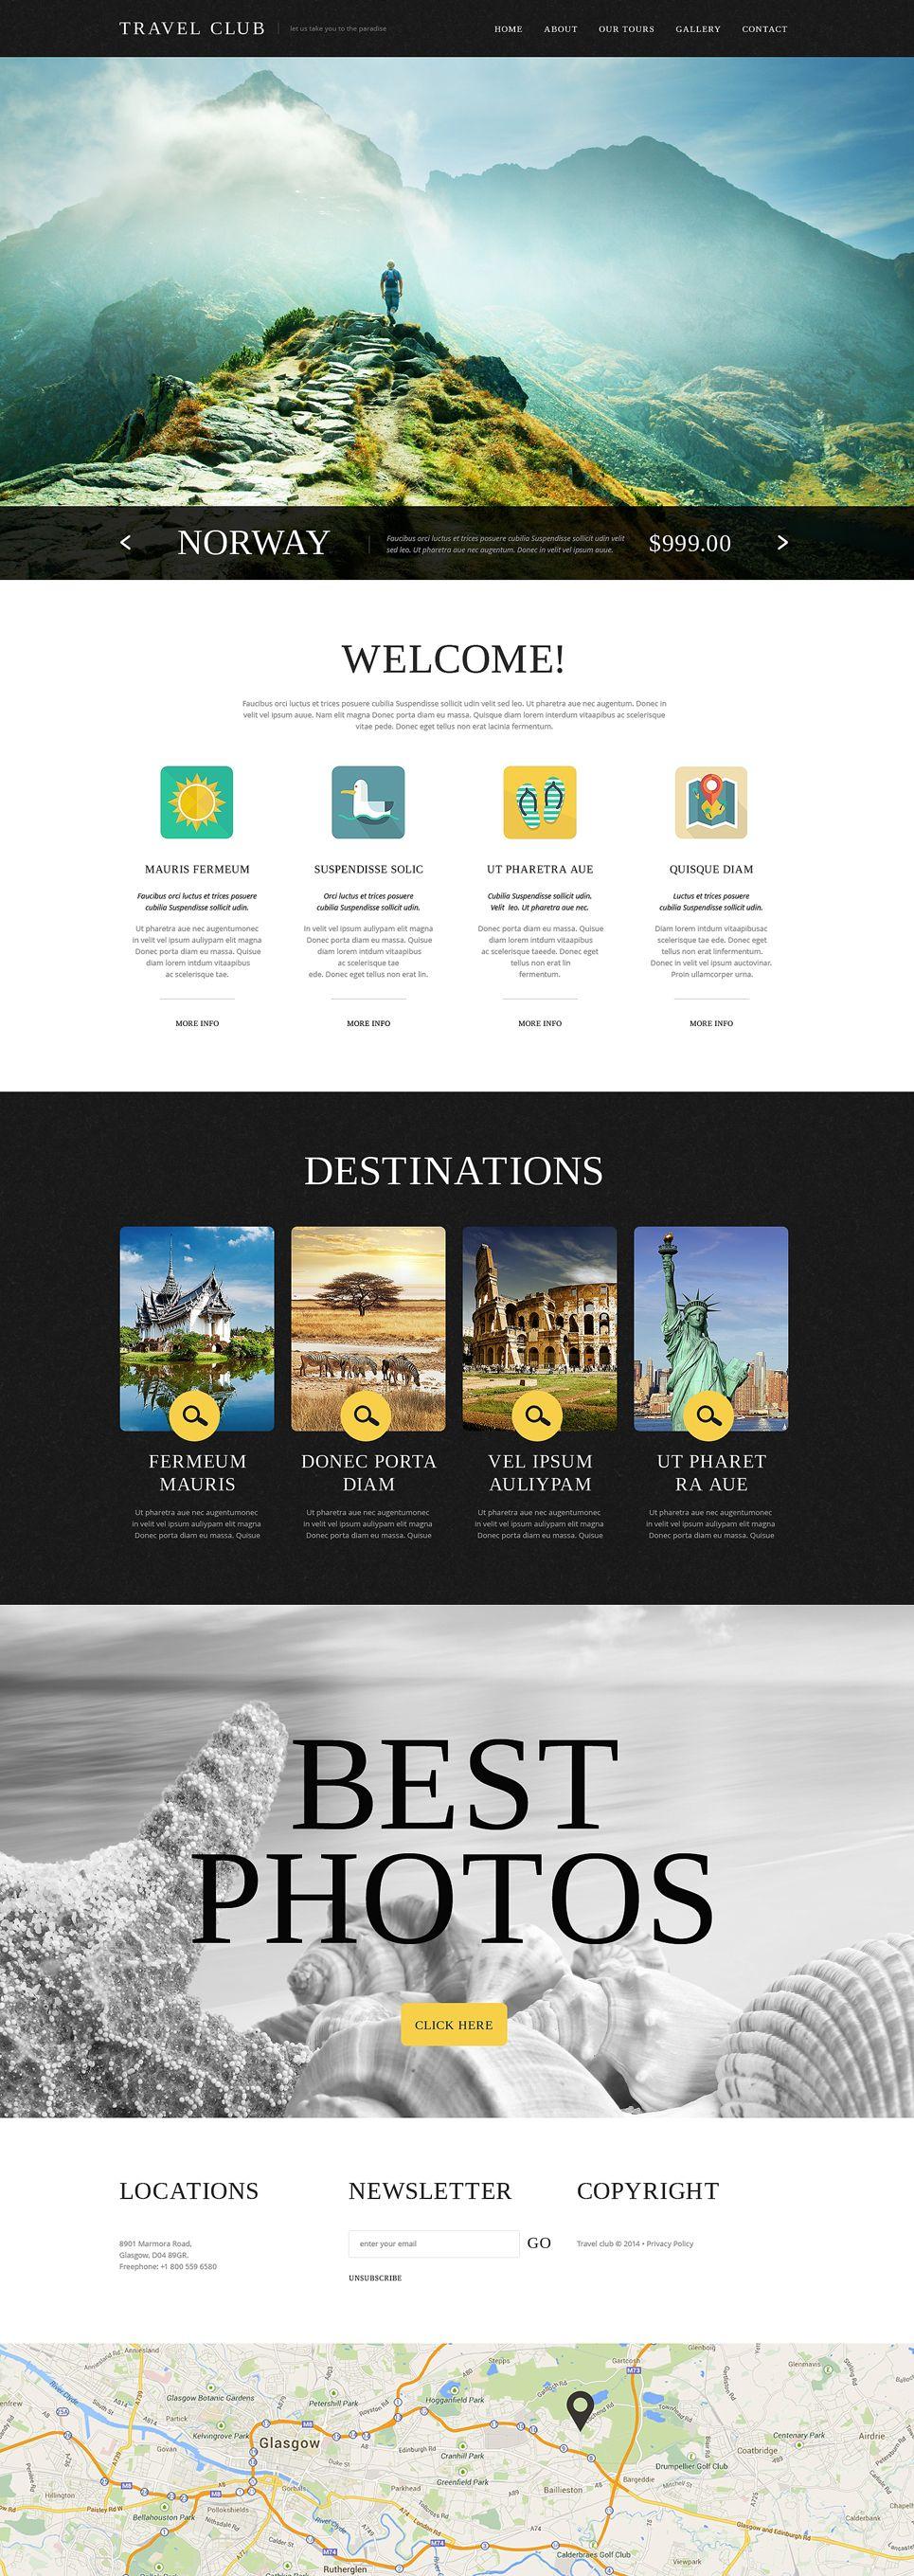 Travel Agency Website Template Agency Travel Template Travel Agency Website Website Template Travel Website Design